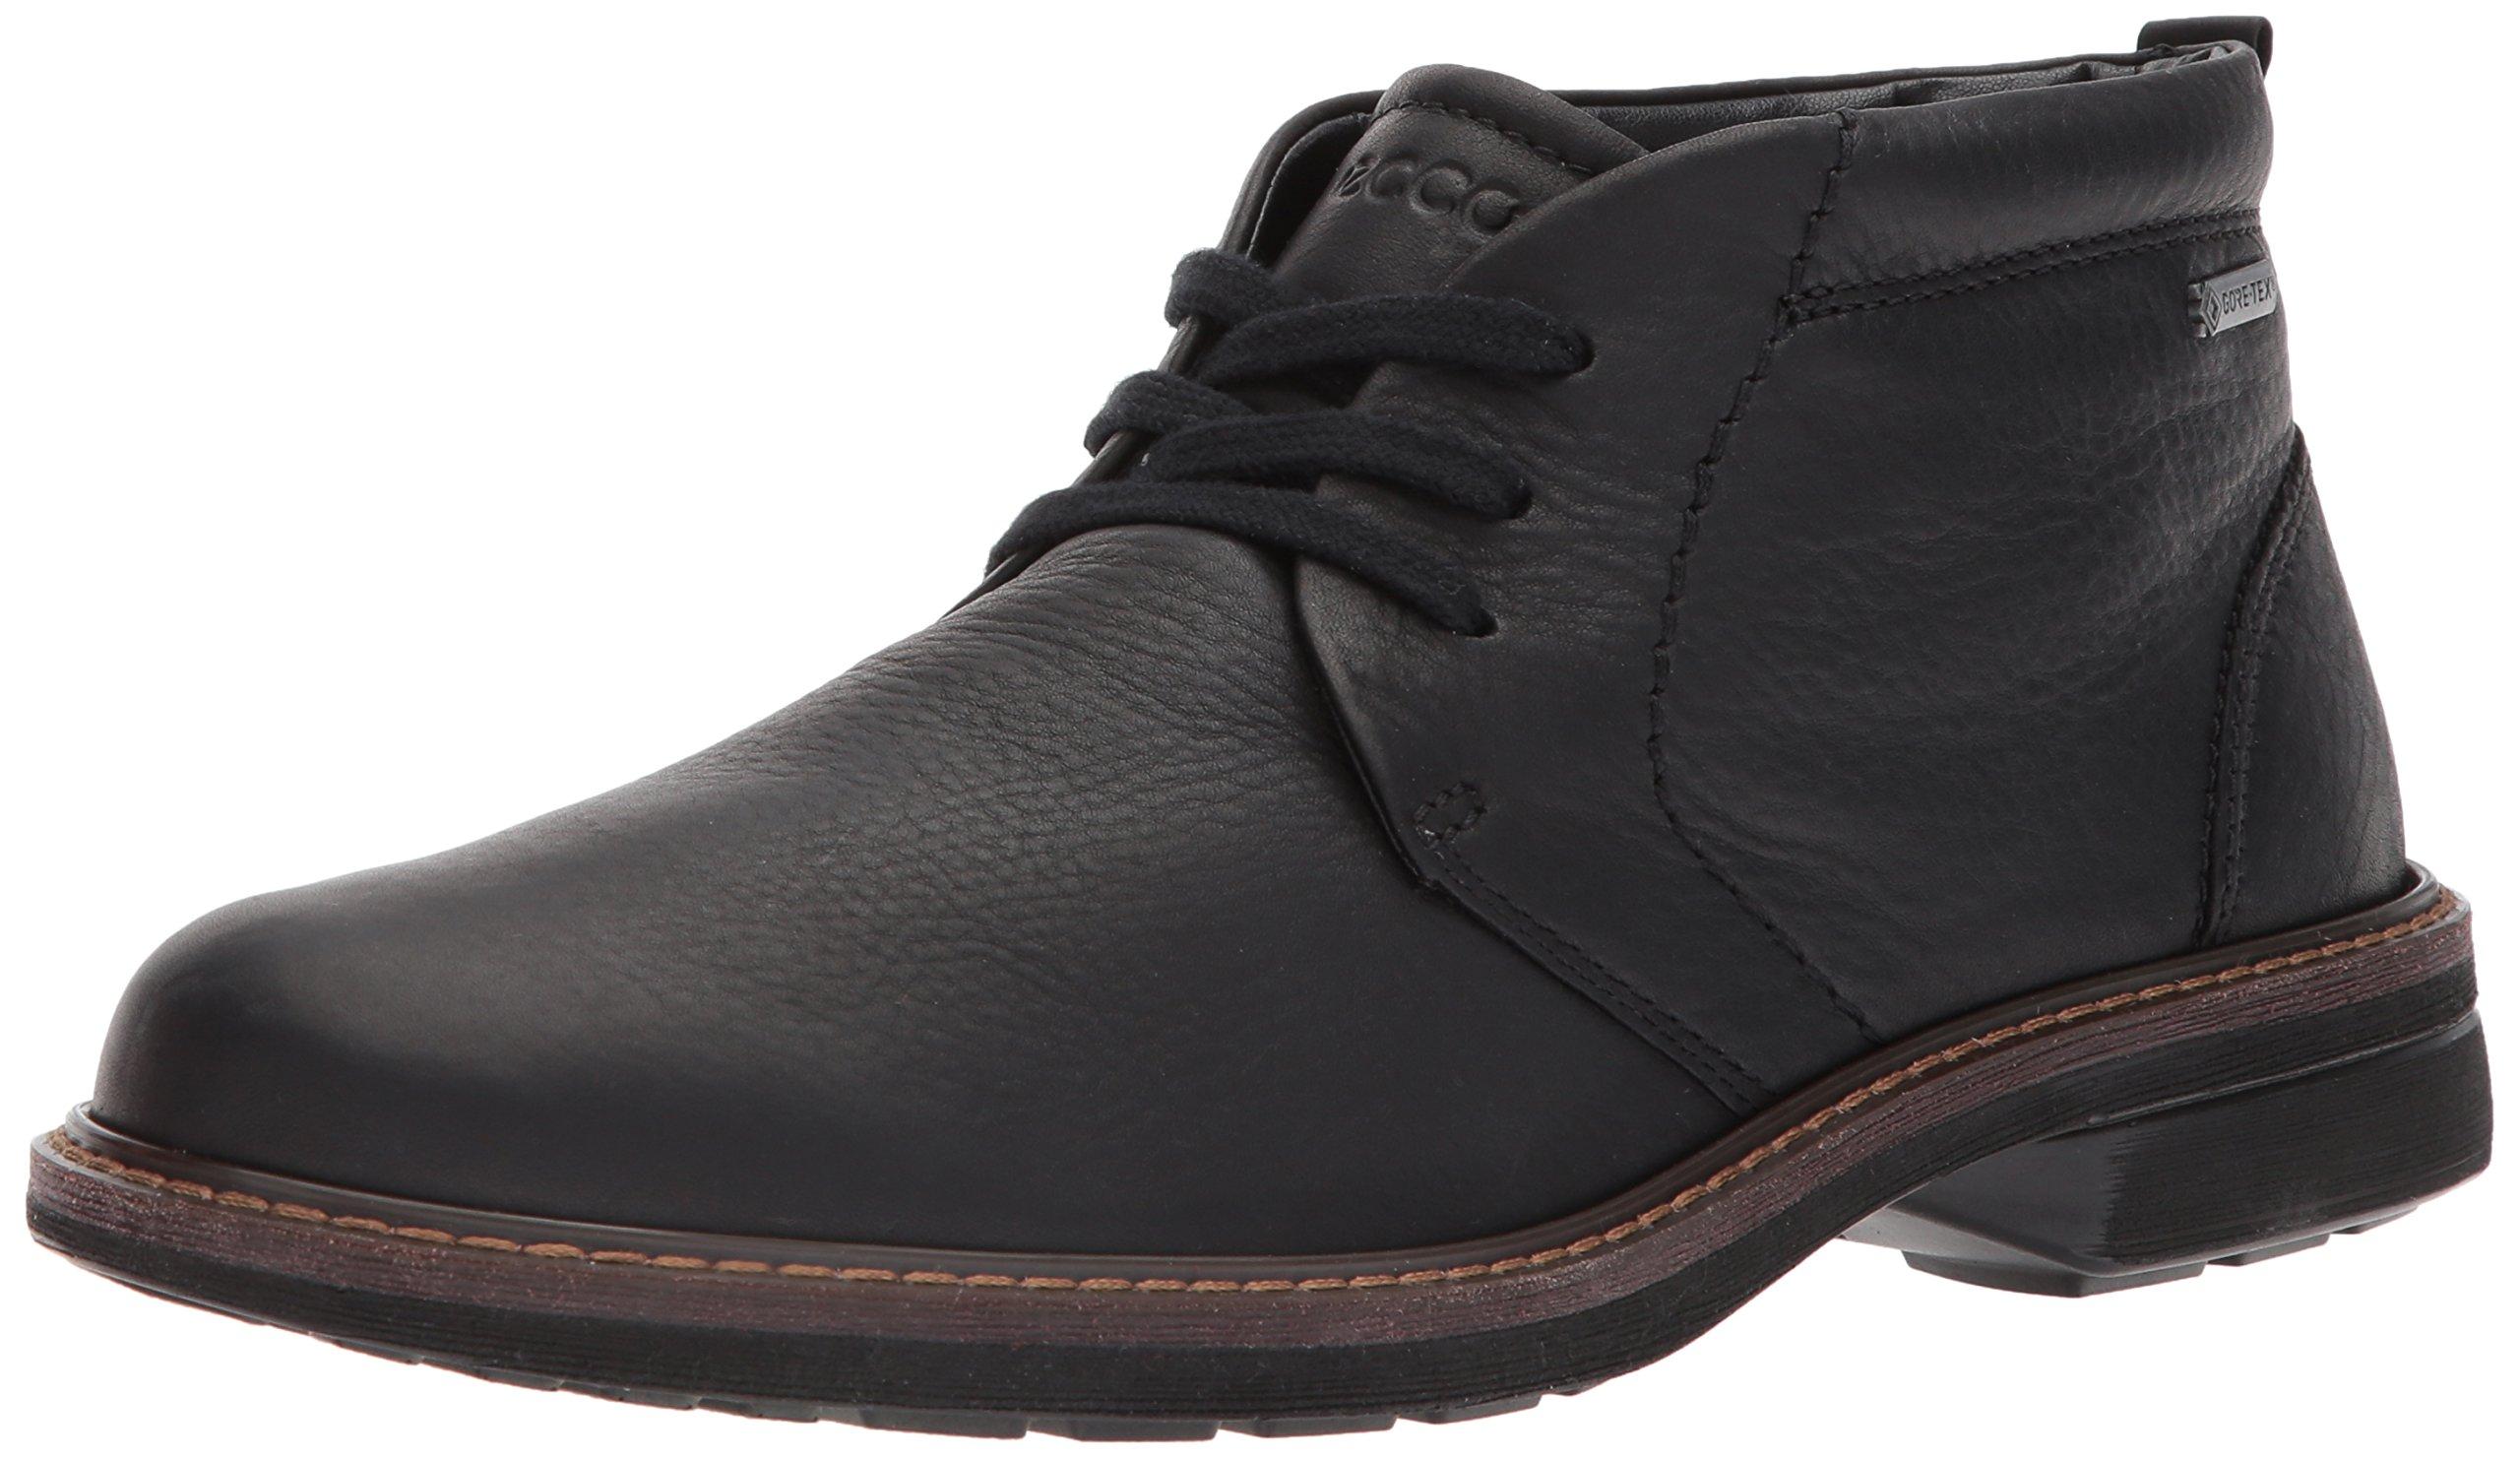 ECCO Men's Turn Gore-TEX Tie Chukka Boot, Black, 45 M EU/11-11.5 D(M) US